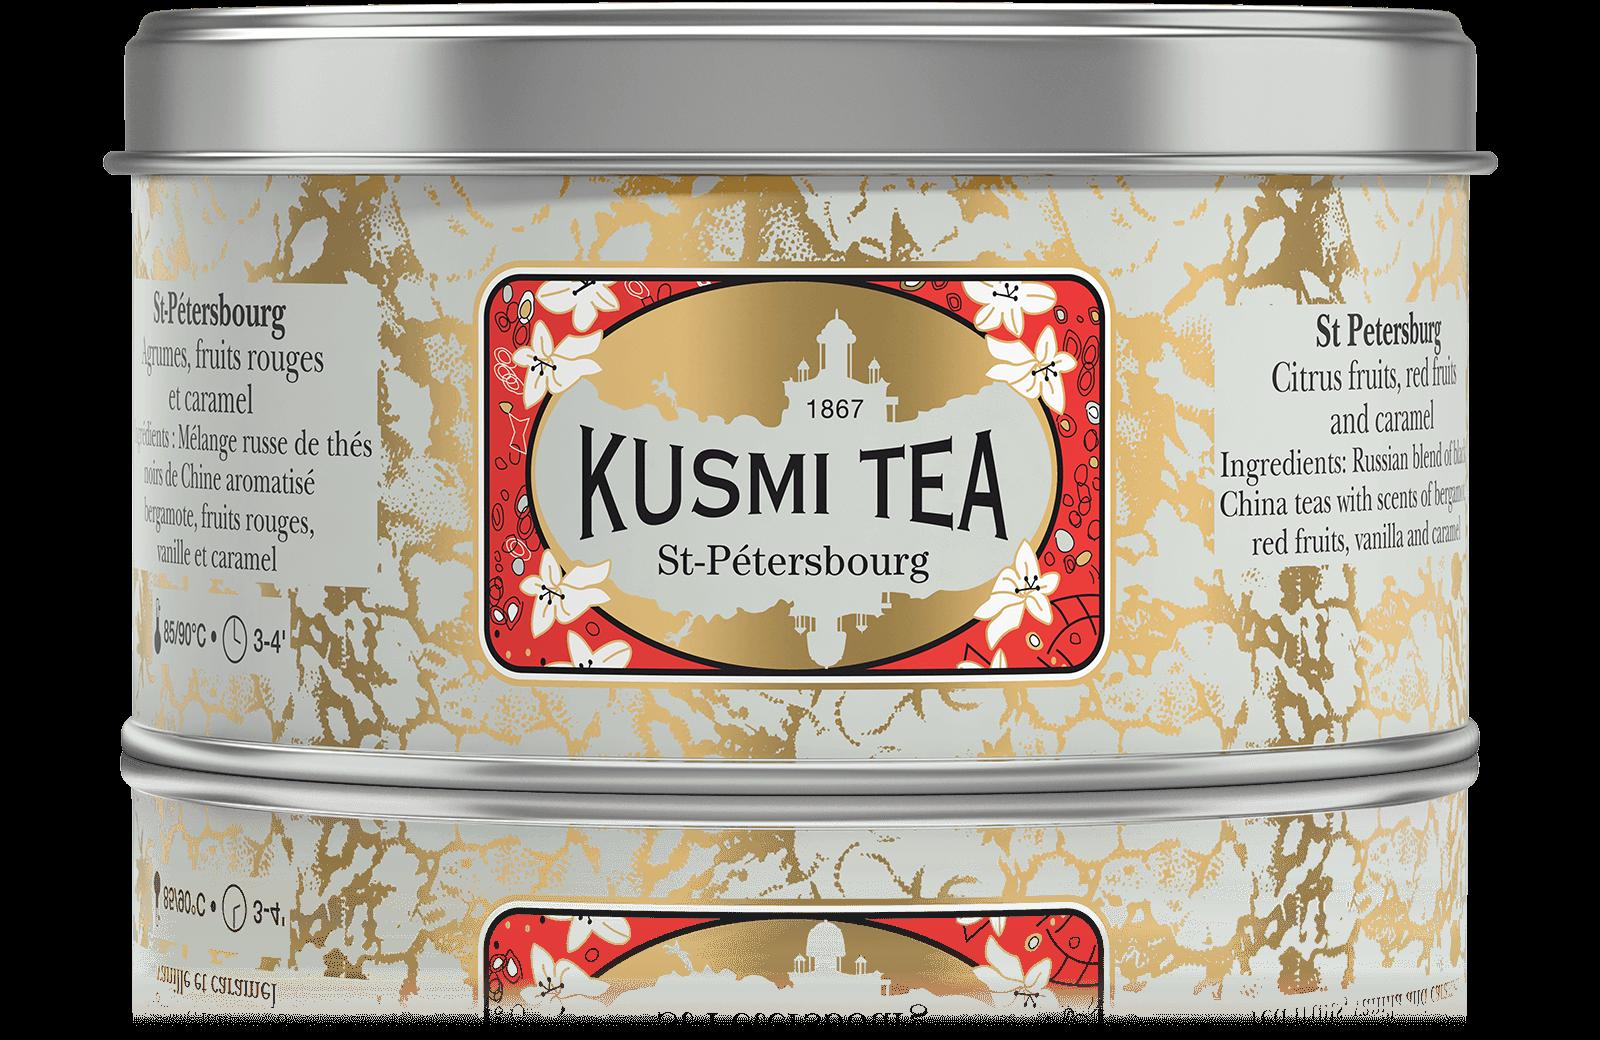 St-Pétersbourg - Thé noir earl grey, caramel, fruit - Boîte de thé en vrac - Kusmi Tea